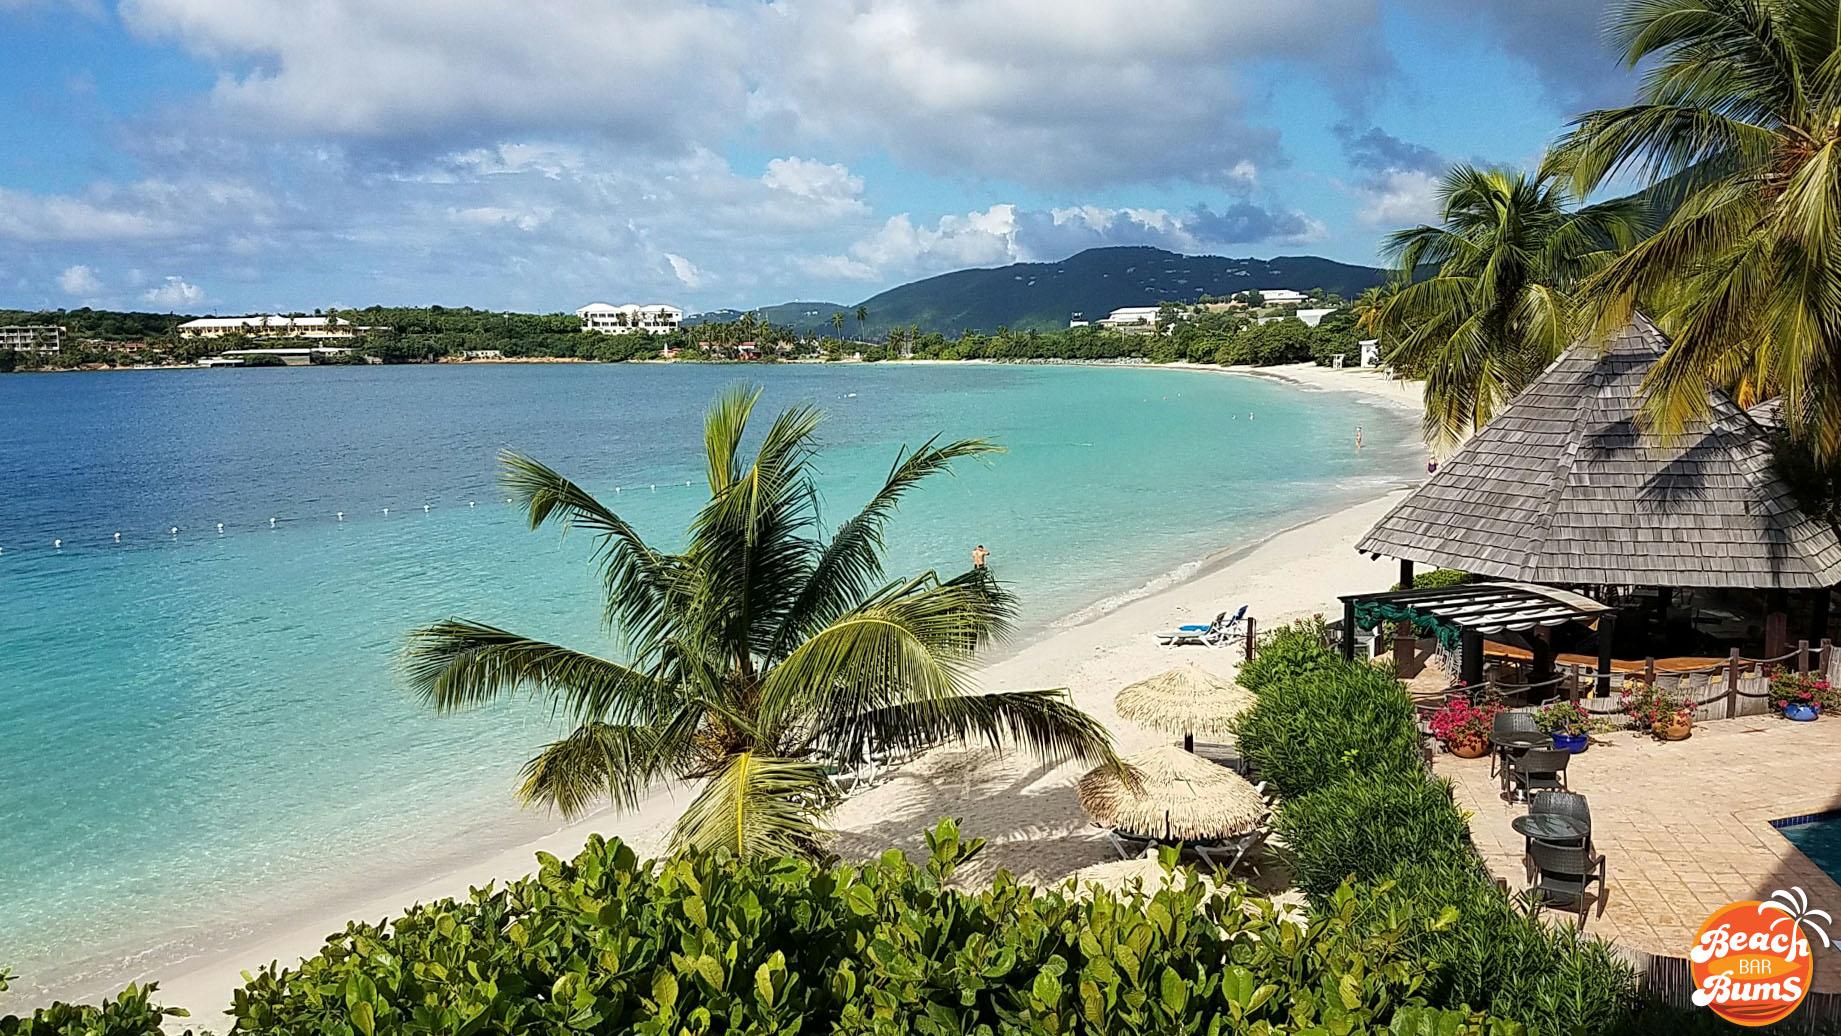 emerald beach resort, caribbean, lindbergh bay, st. thomas, usvi, us virgin islands